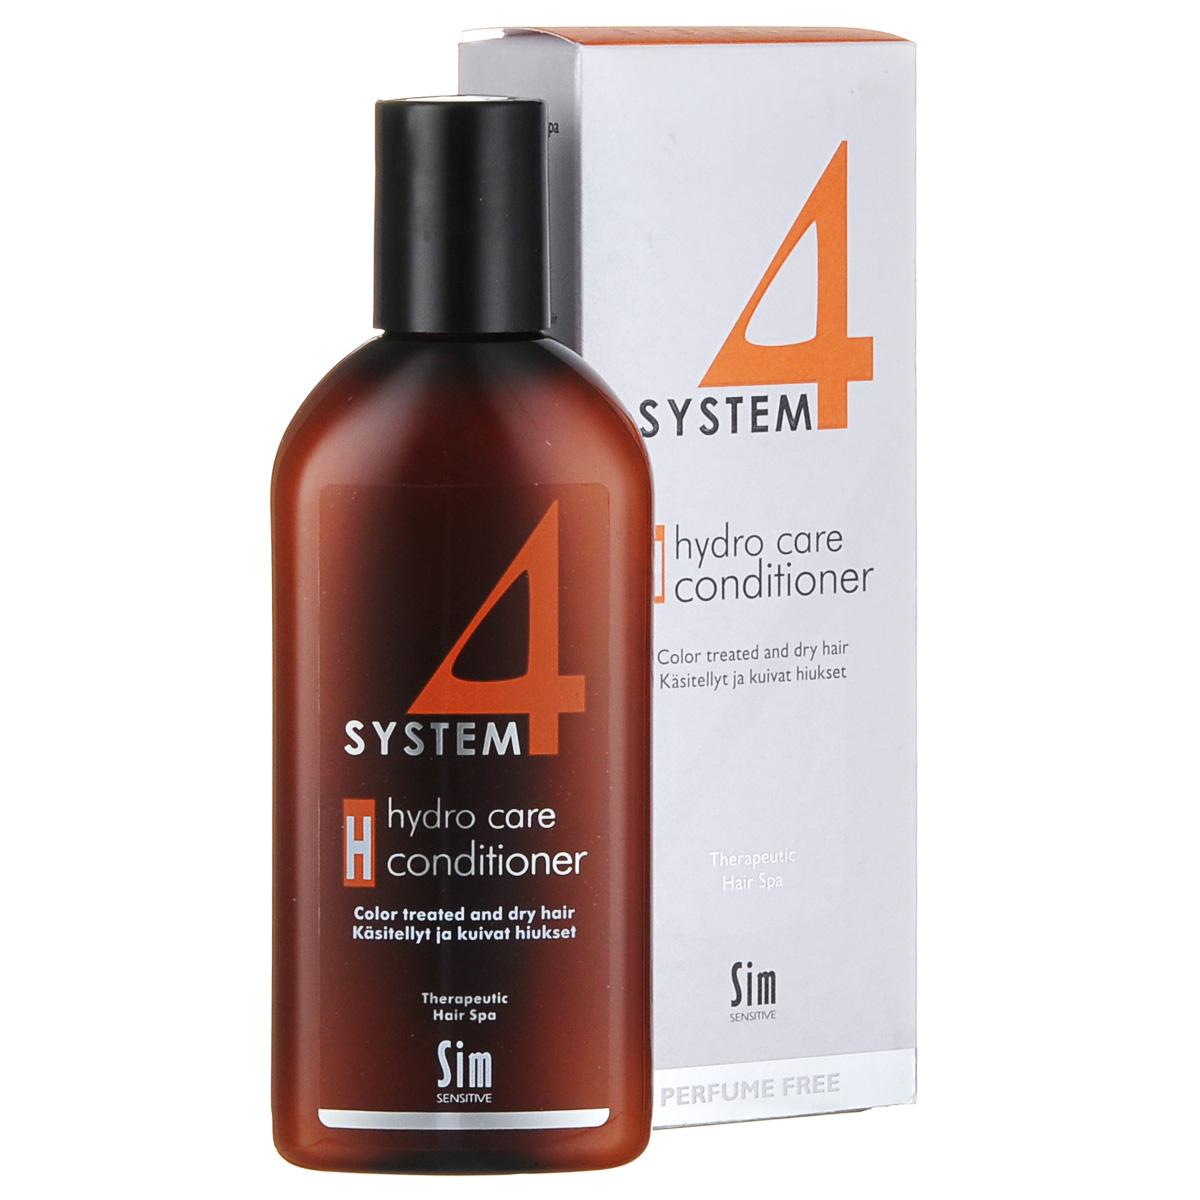 SIM SENSITIVE Терапевтический бальзам H SYSTEM 4 Hydro Care Conditioner «Н» , 215 мл sim sensitive восстановление волос r system 4 chitosan hair repair r 100 мл